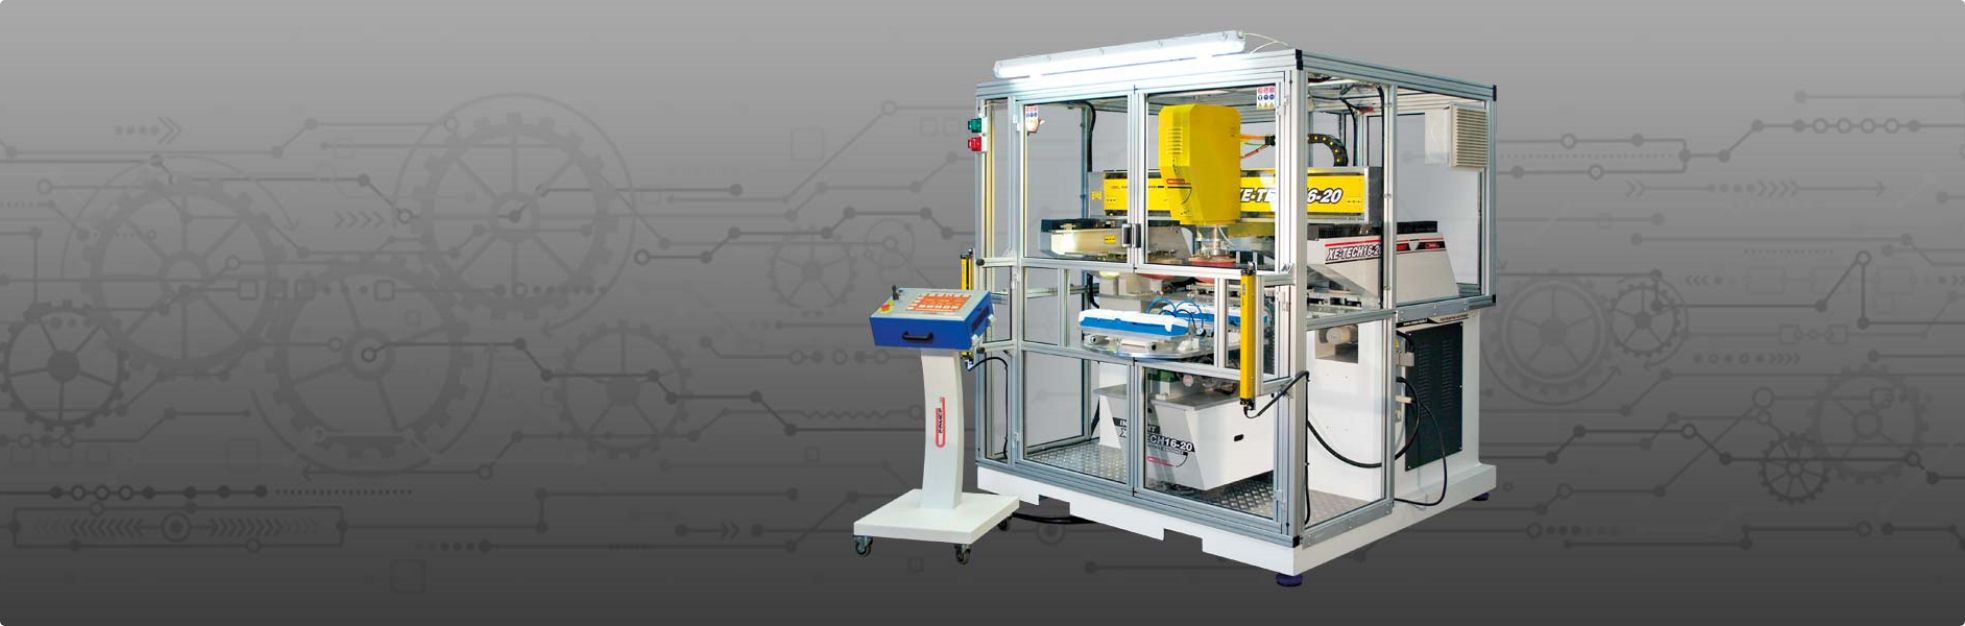 XETech 16-20 Pad Printing Machine